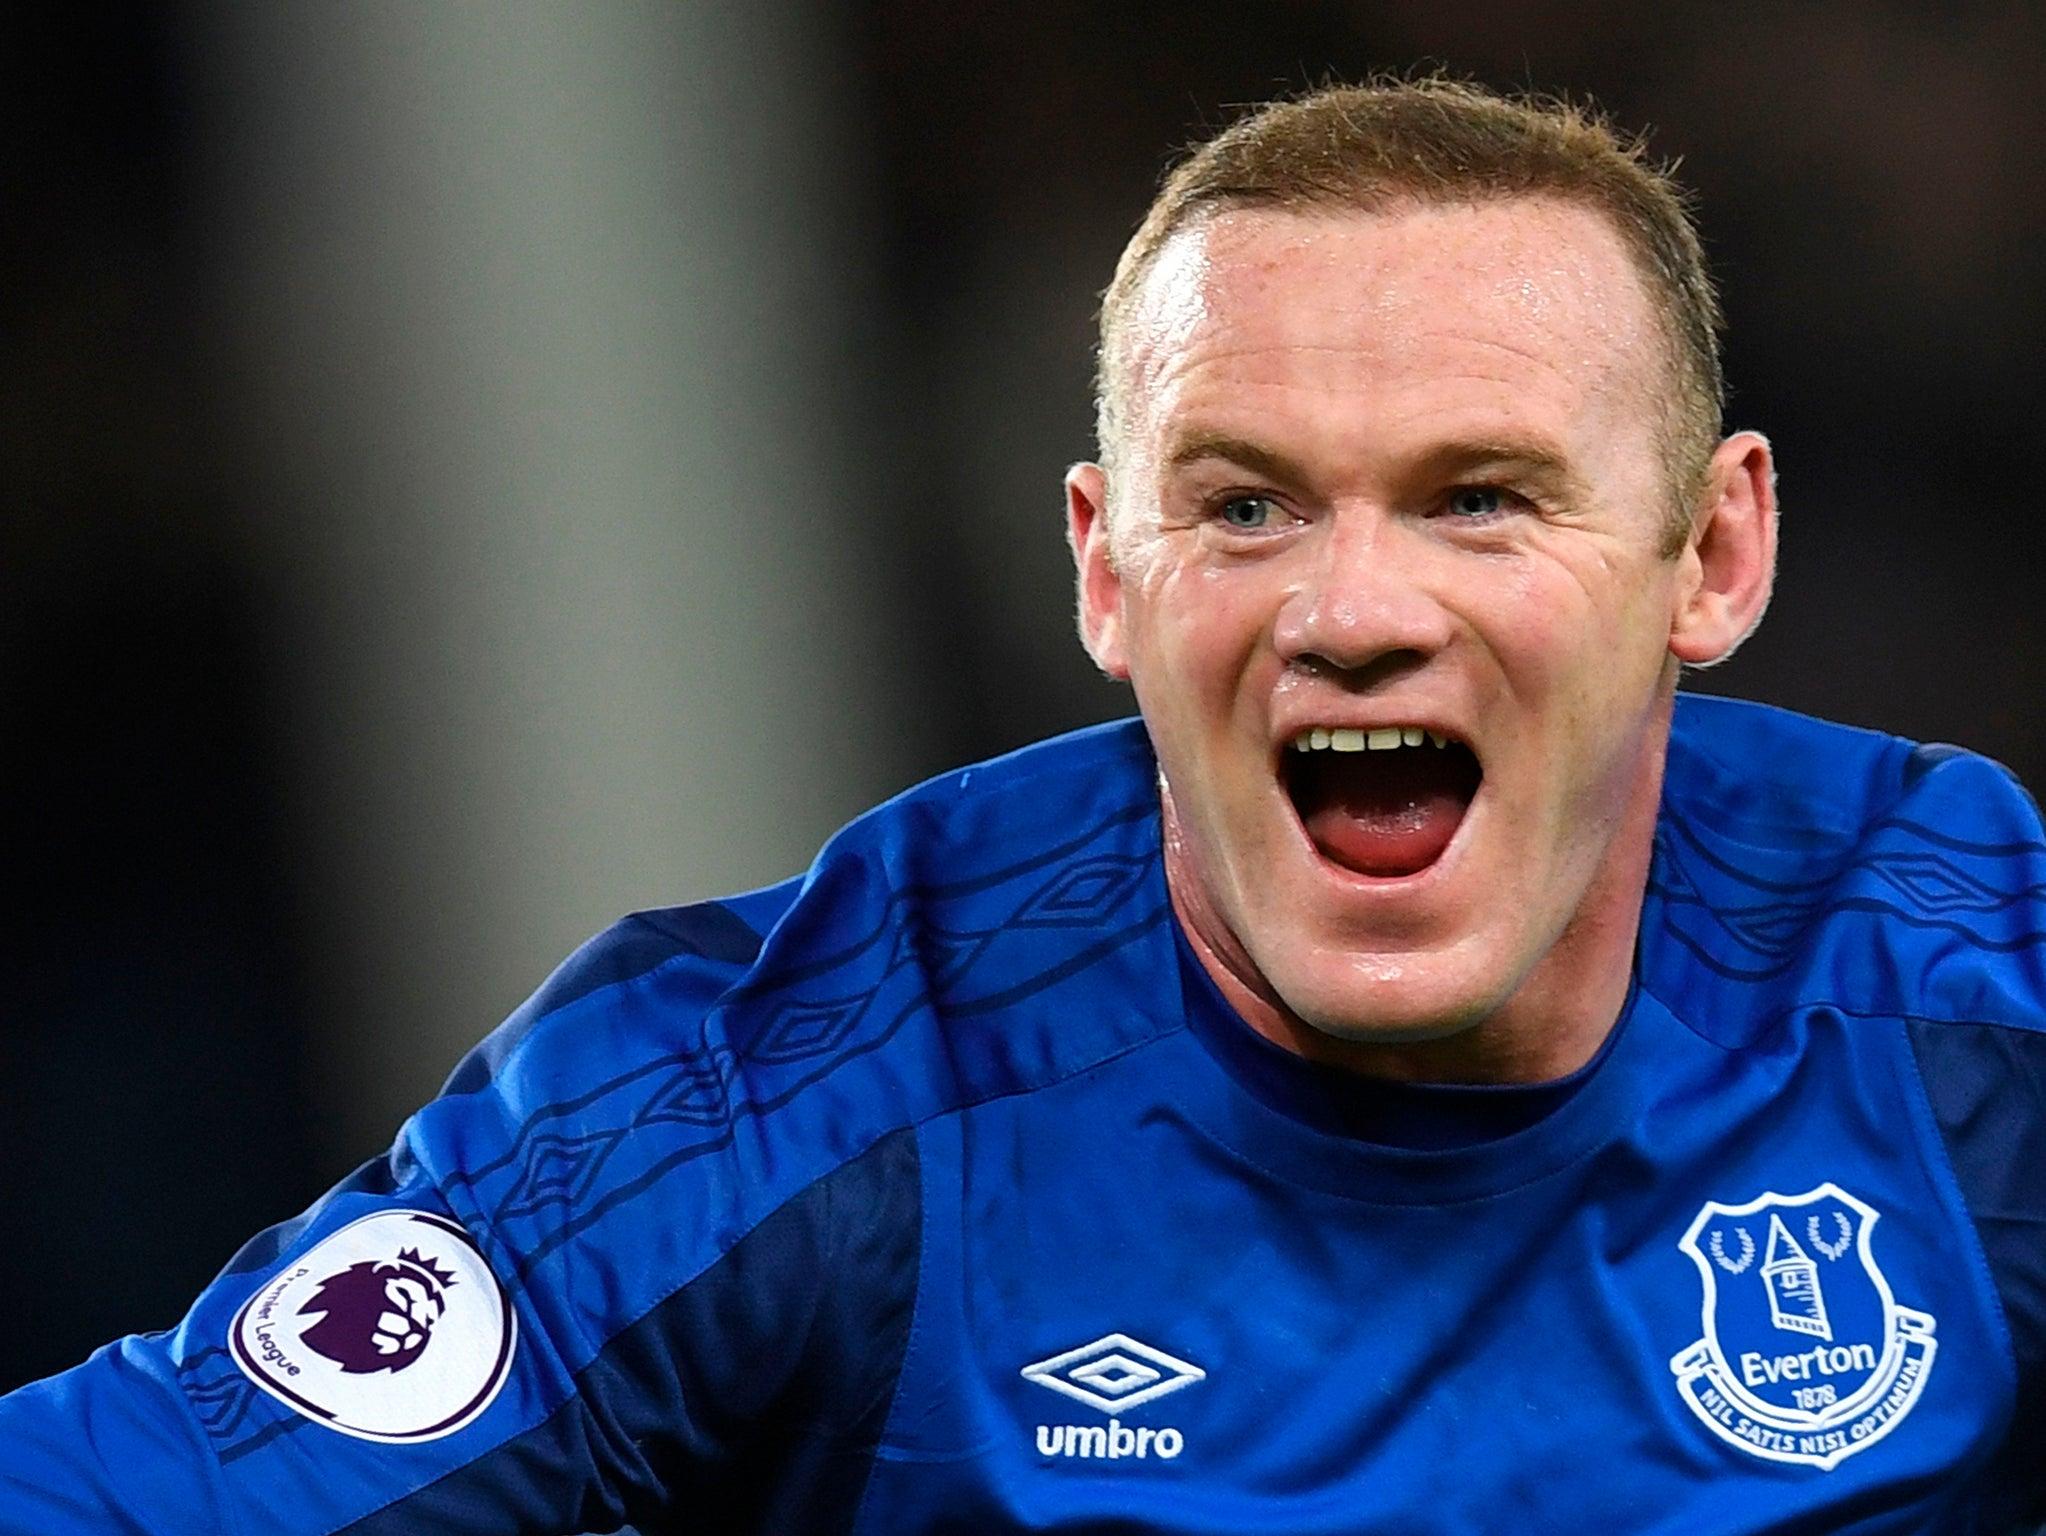 Wayne Rooney scores sublime hat-trick as Everton thrash West Ham in front of new manager Sam Allardyce